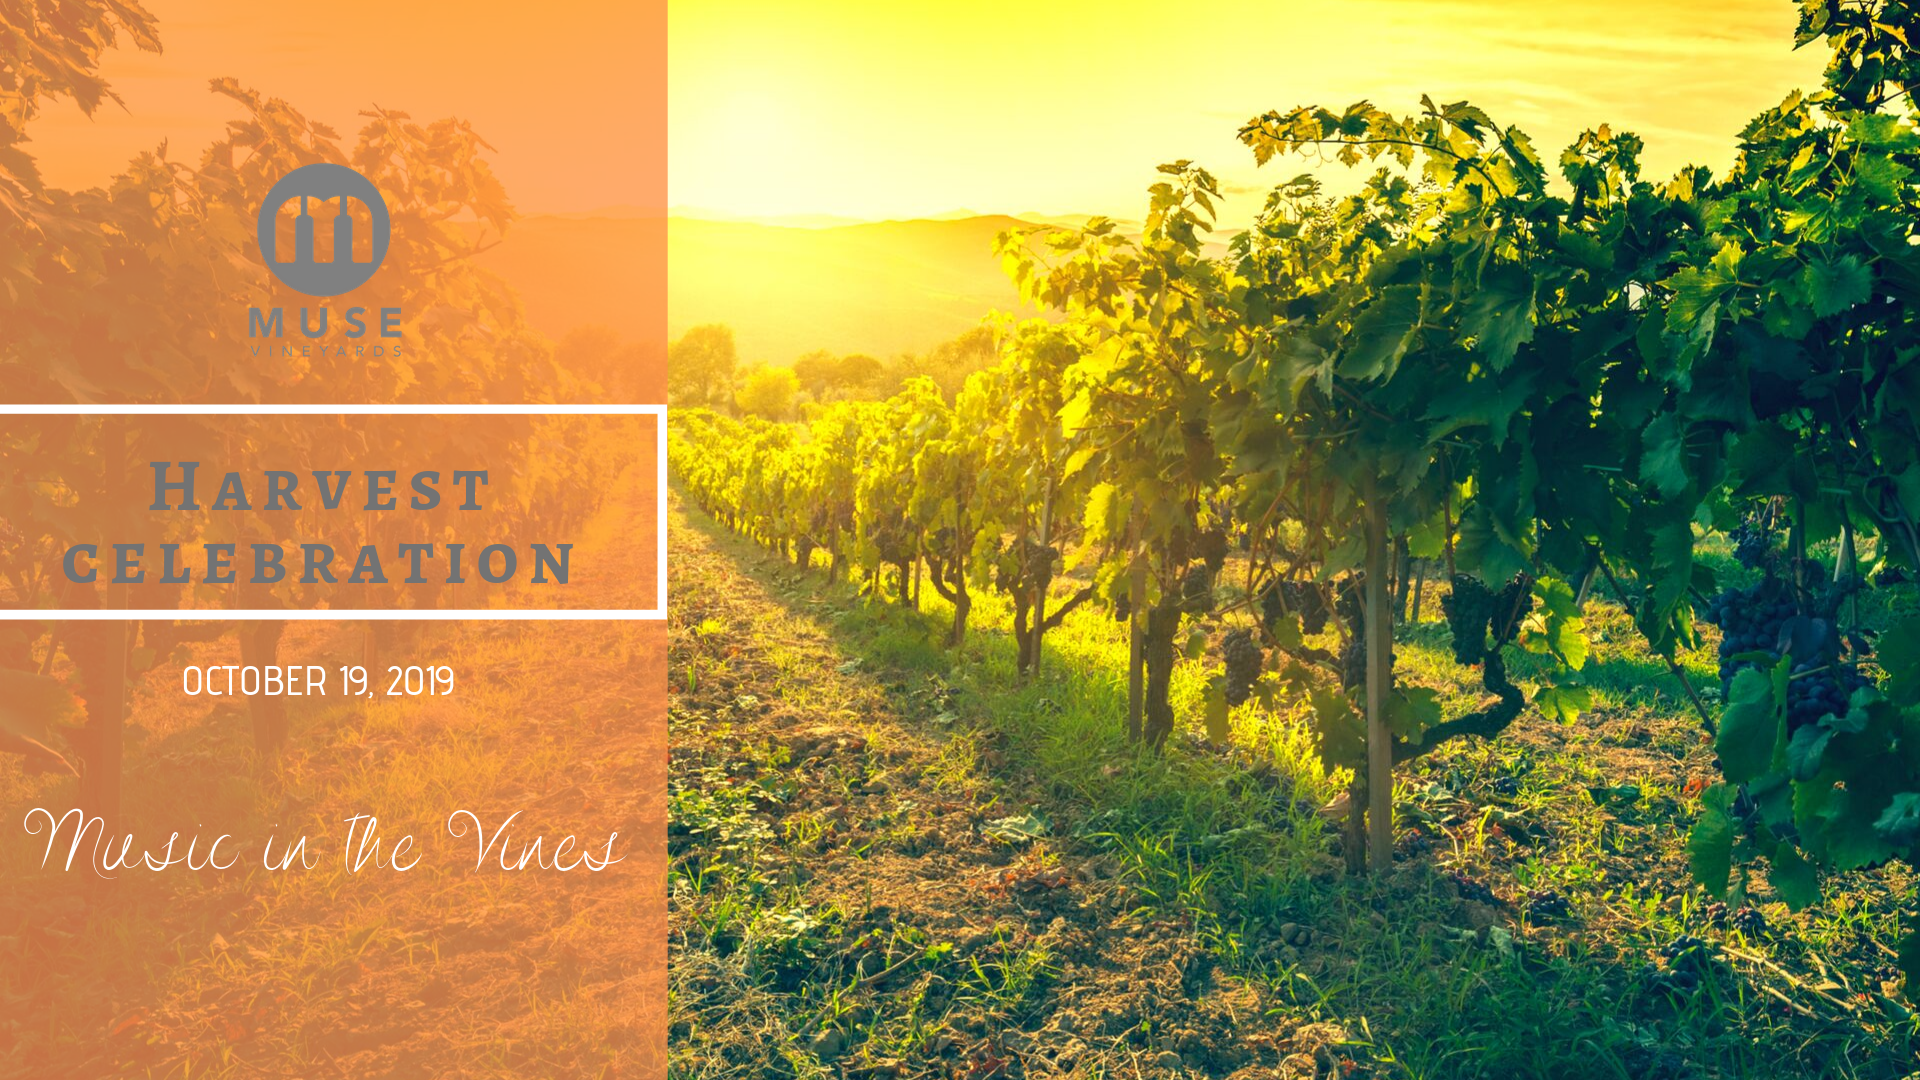 Harvest celebration 2019 (1)